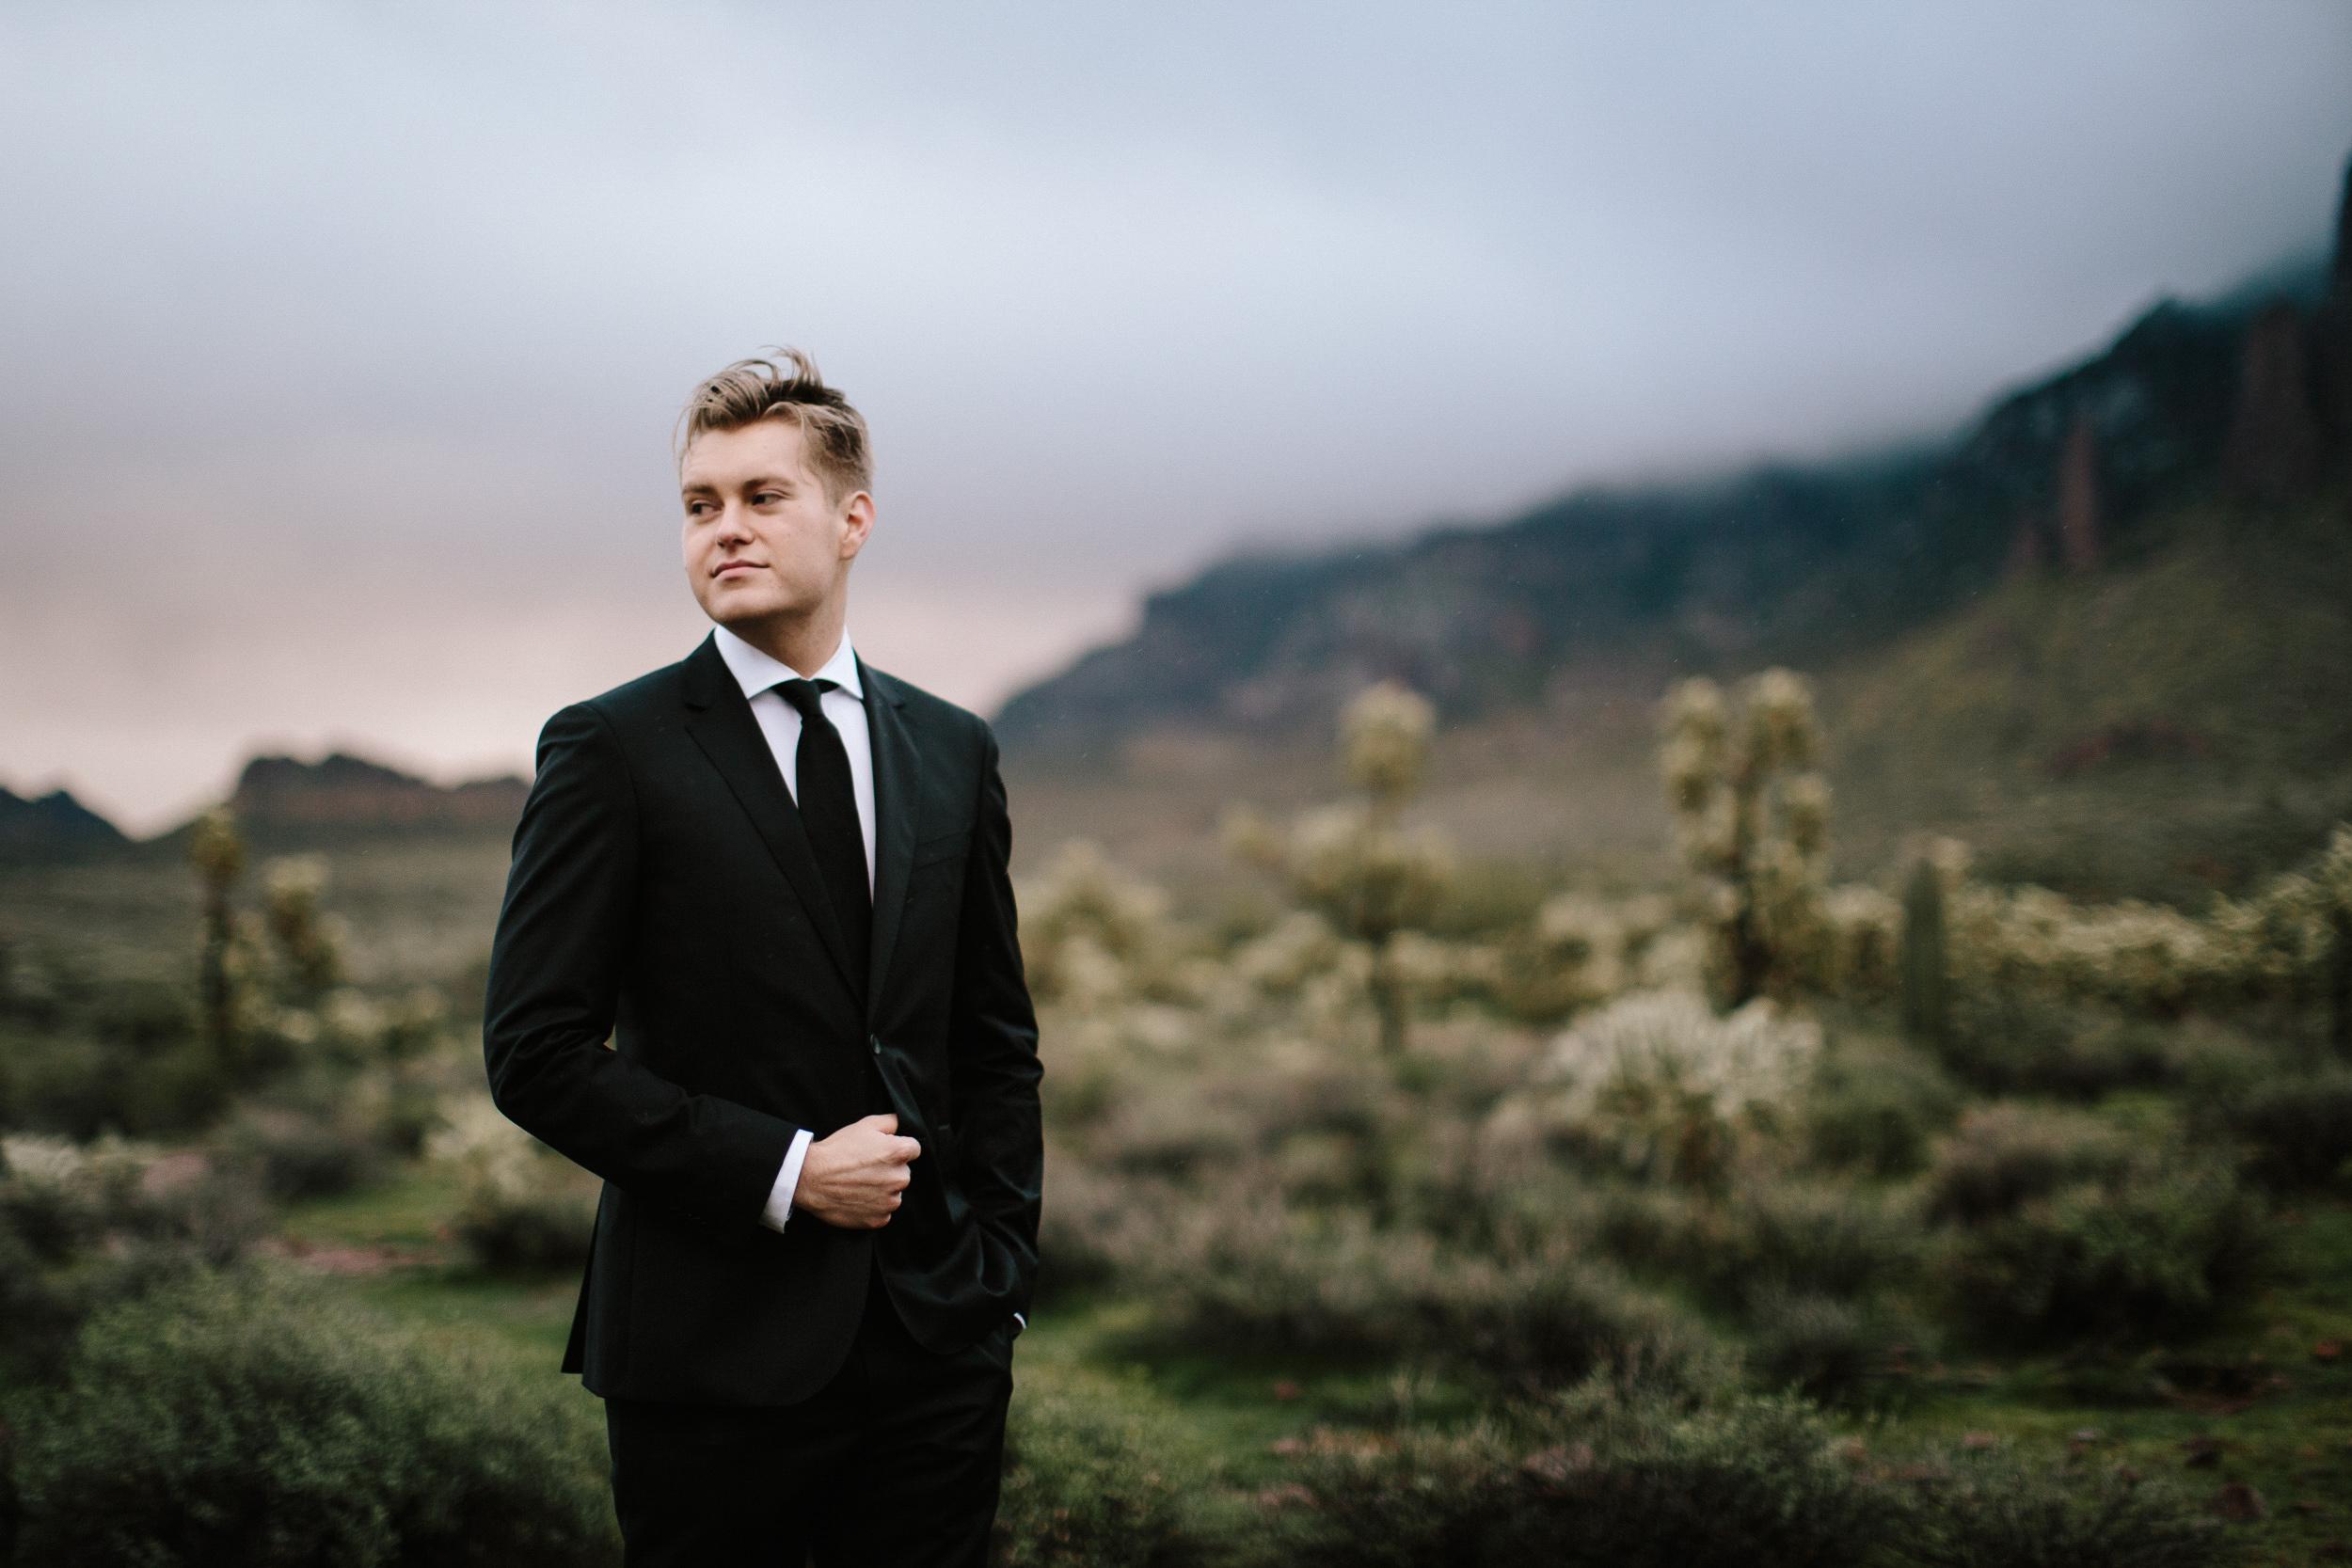 phoenix-mesa-elopement-wedding-photographer-lost-dutchman-state-park-superstitious-mountains-36.jpg